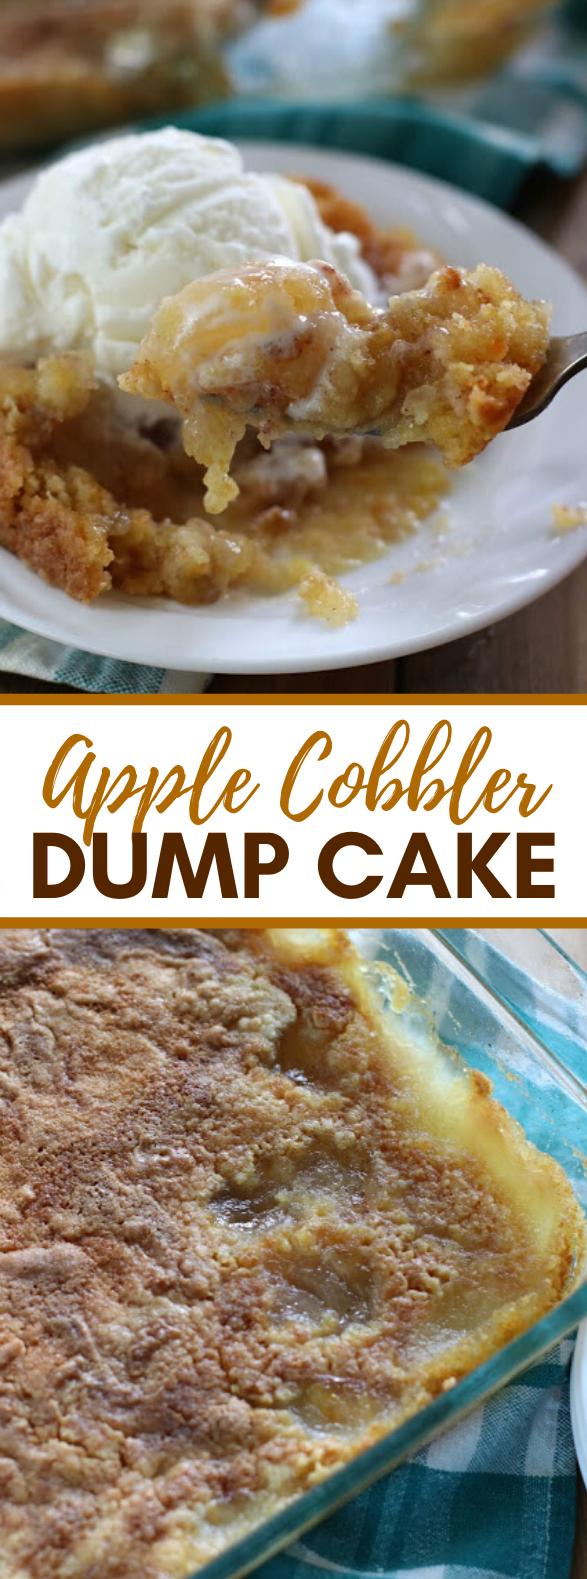 Apple Cobbler Dump Cake #desserts #fallrecipes